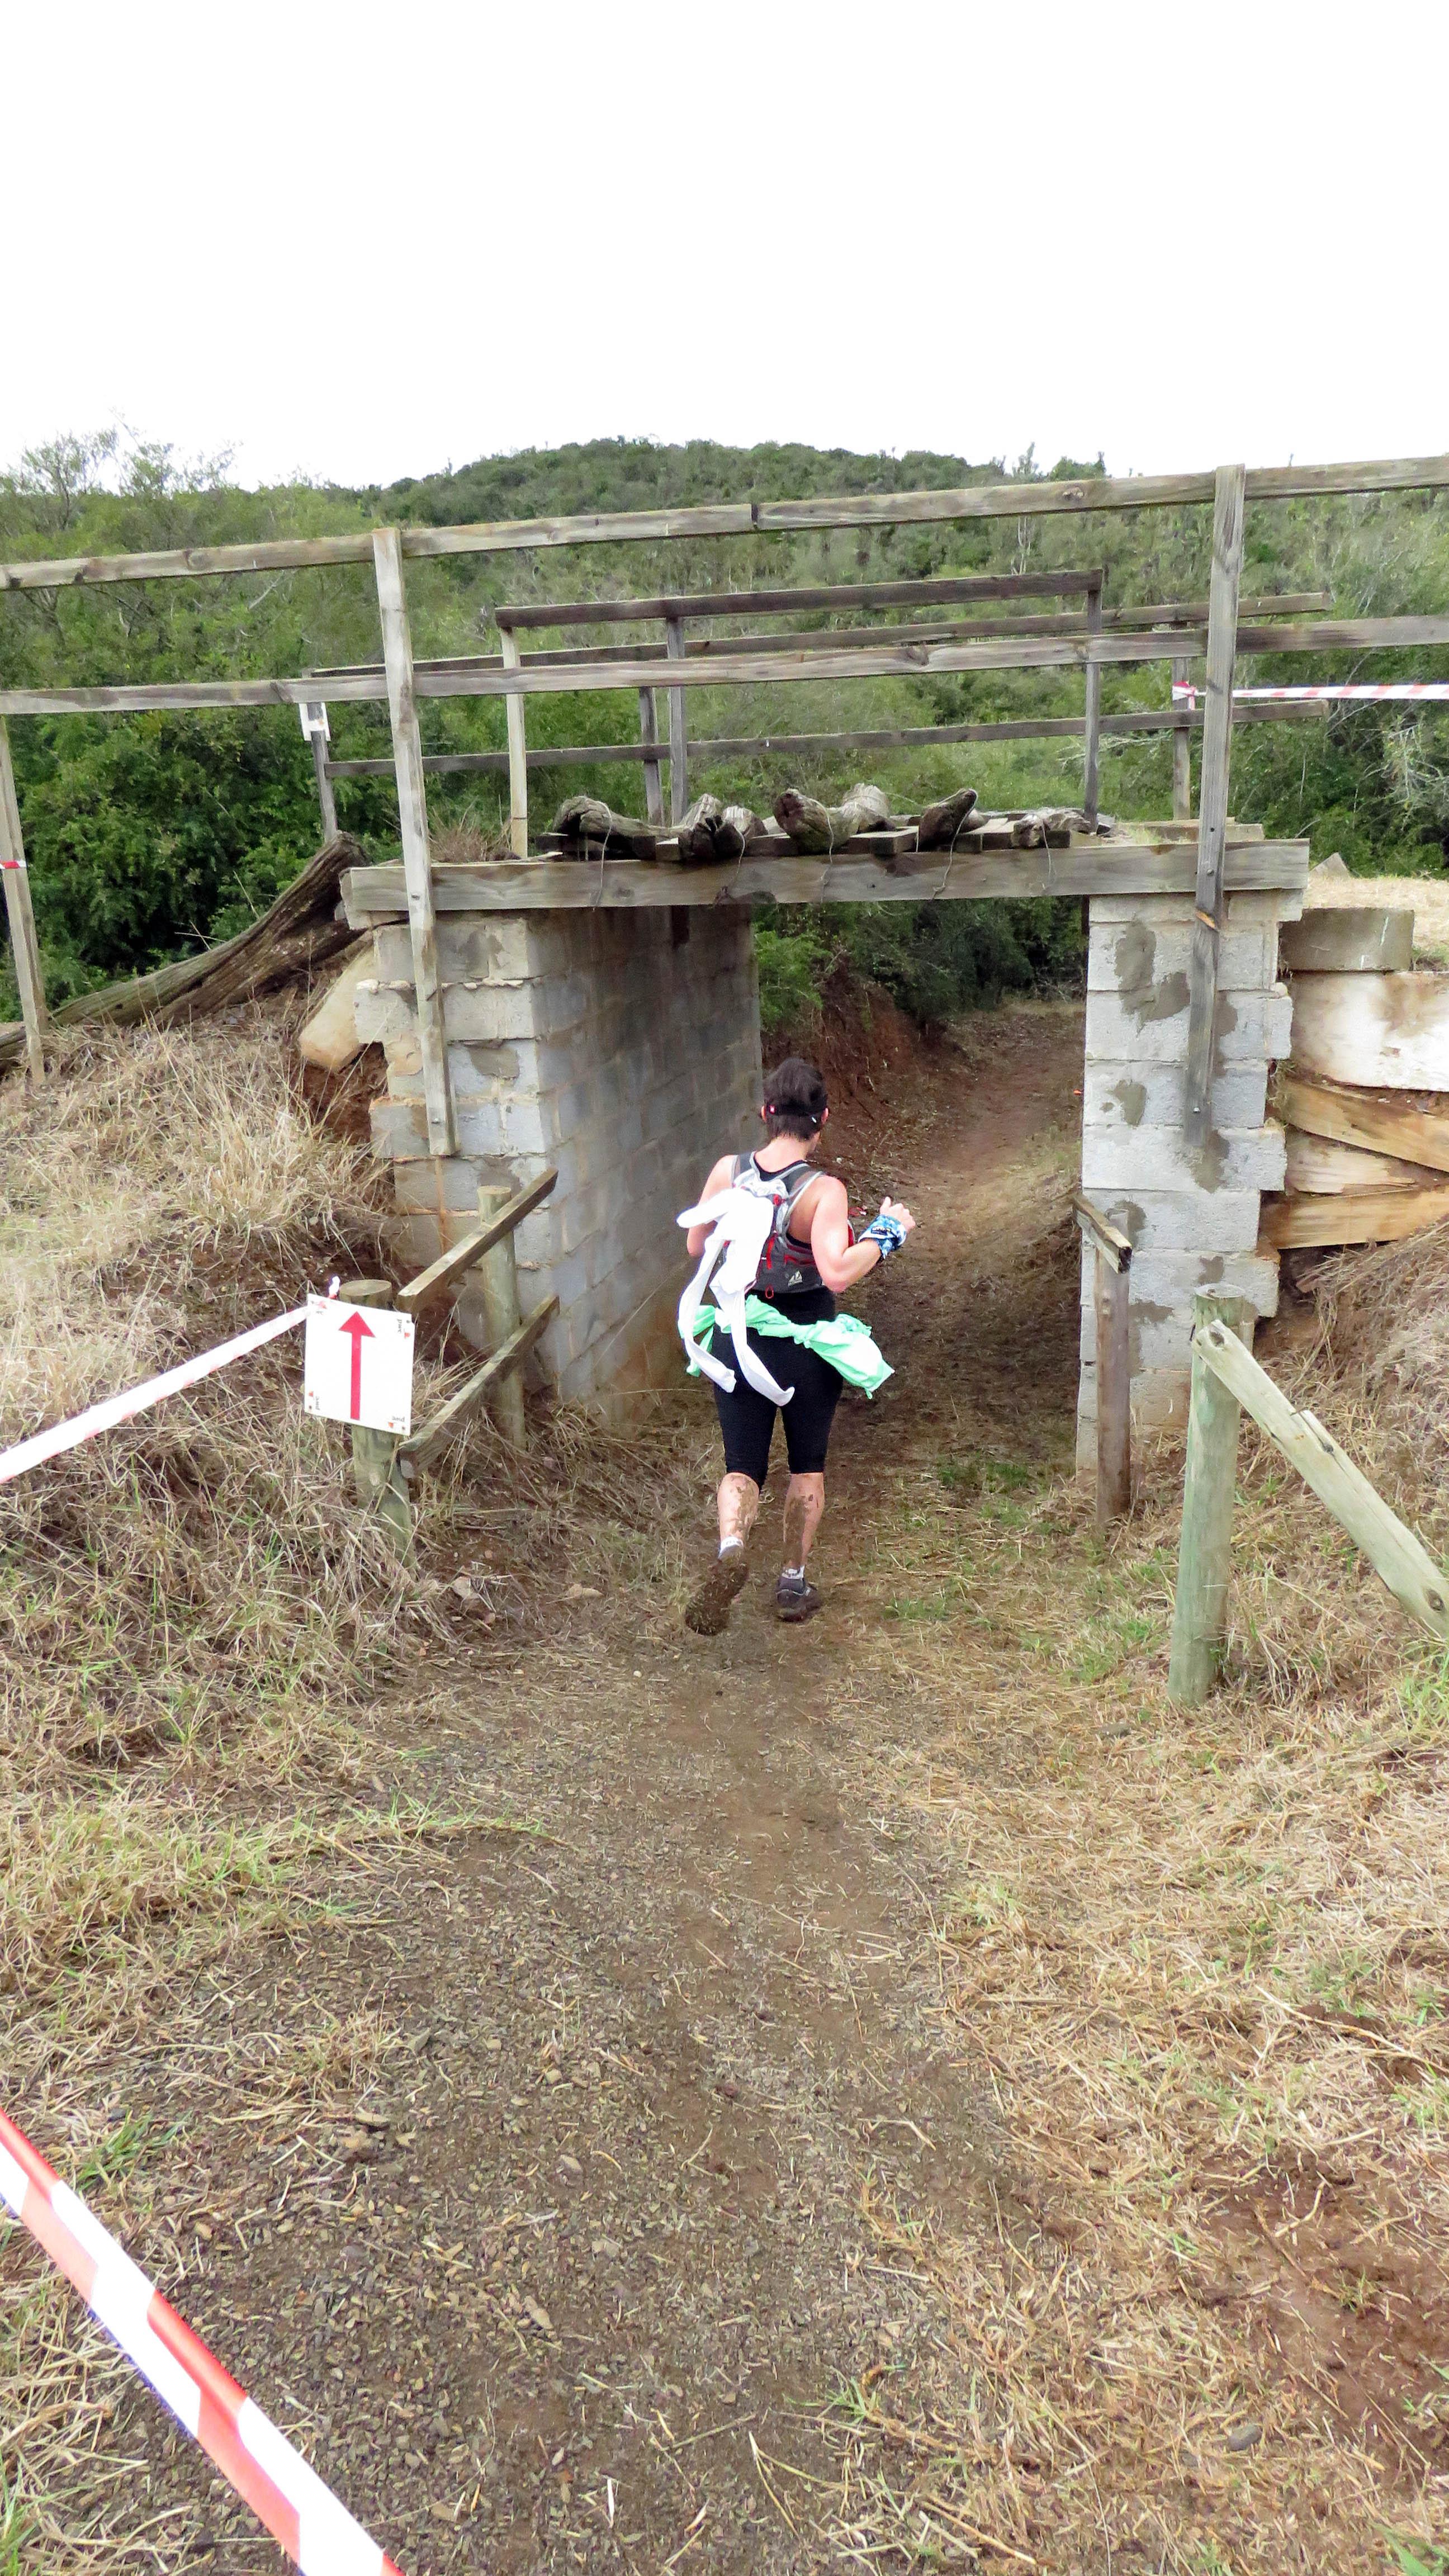 hayterdale trailrun 2018-08-05  (92)